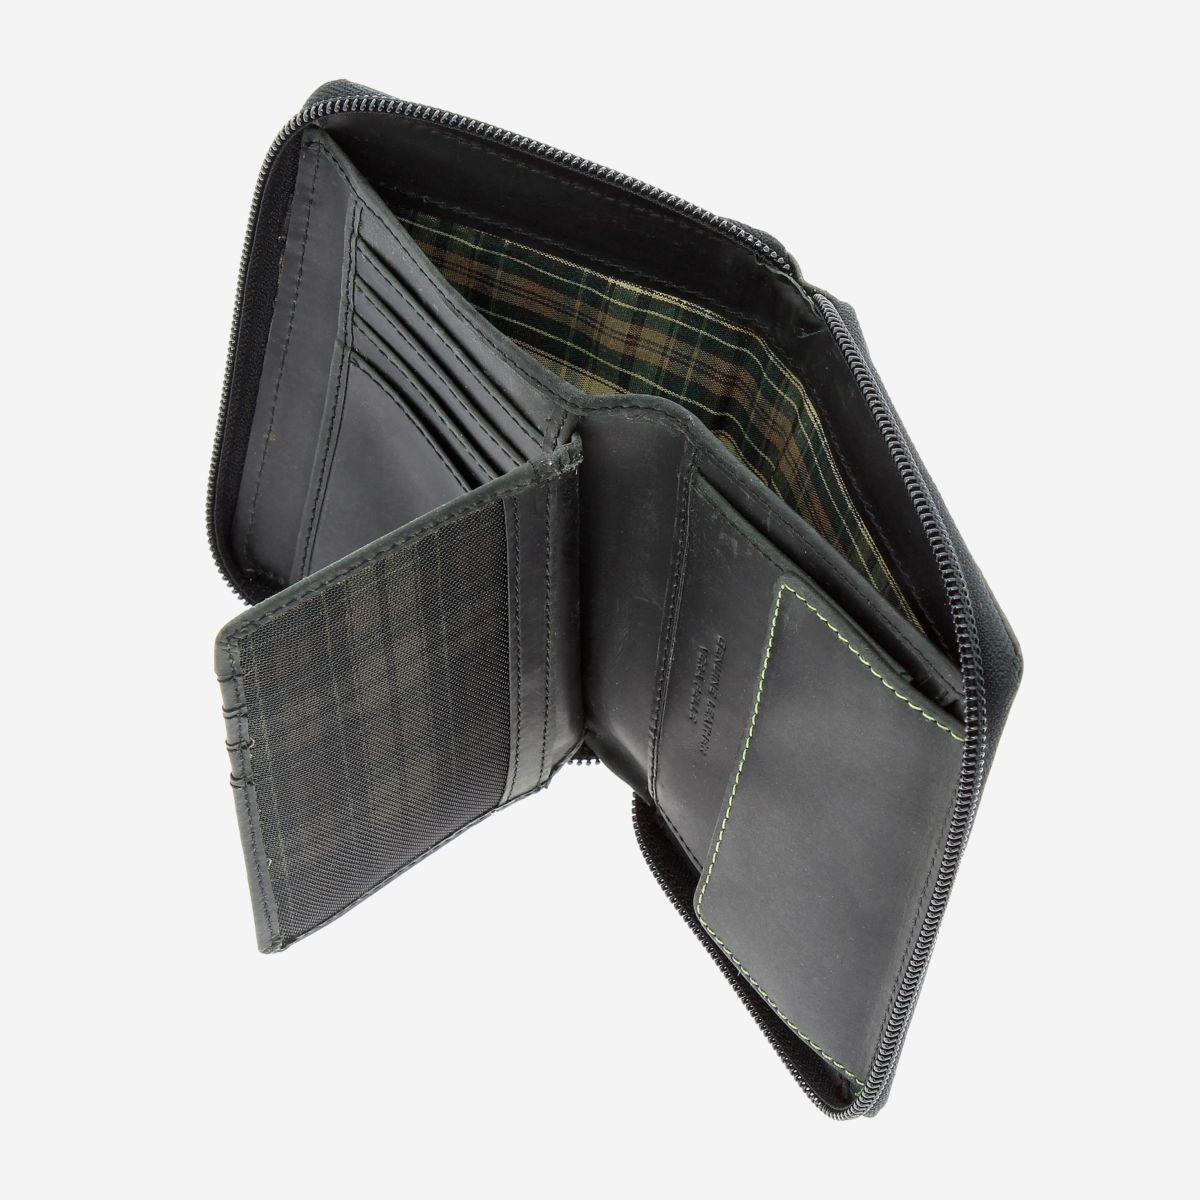 DuDu ארנק עור איטלקי עם רוכסן - שחור